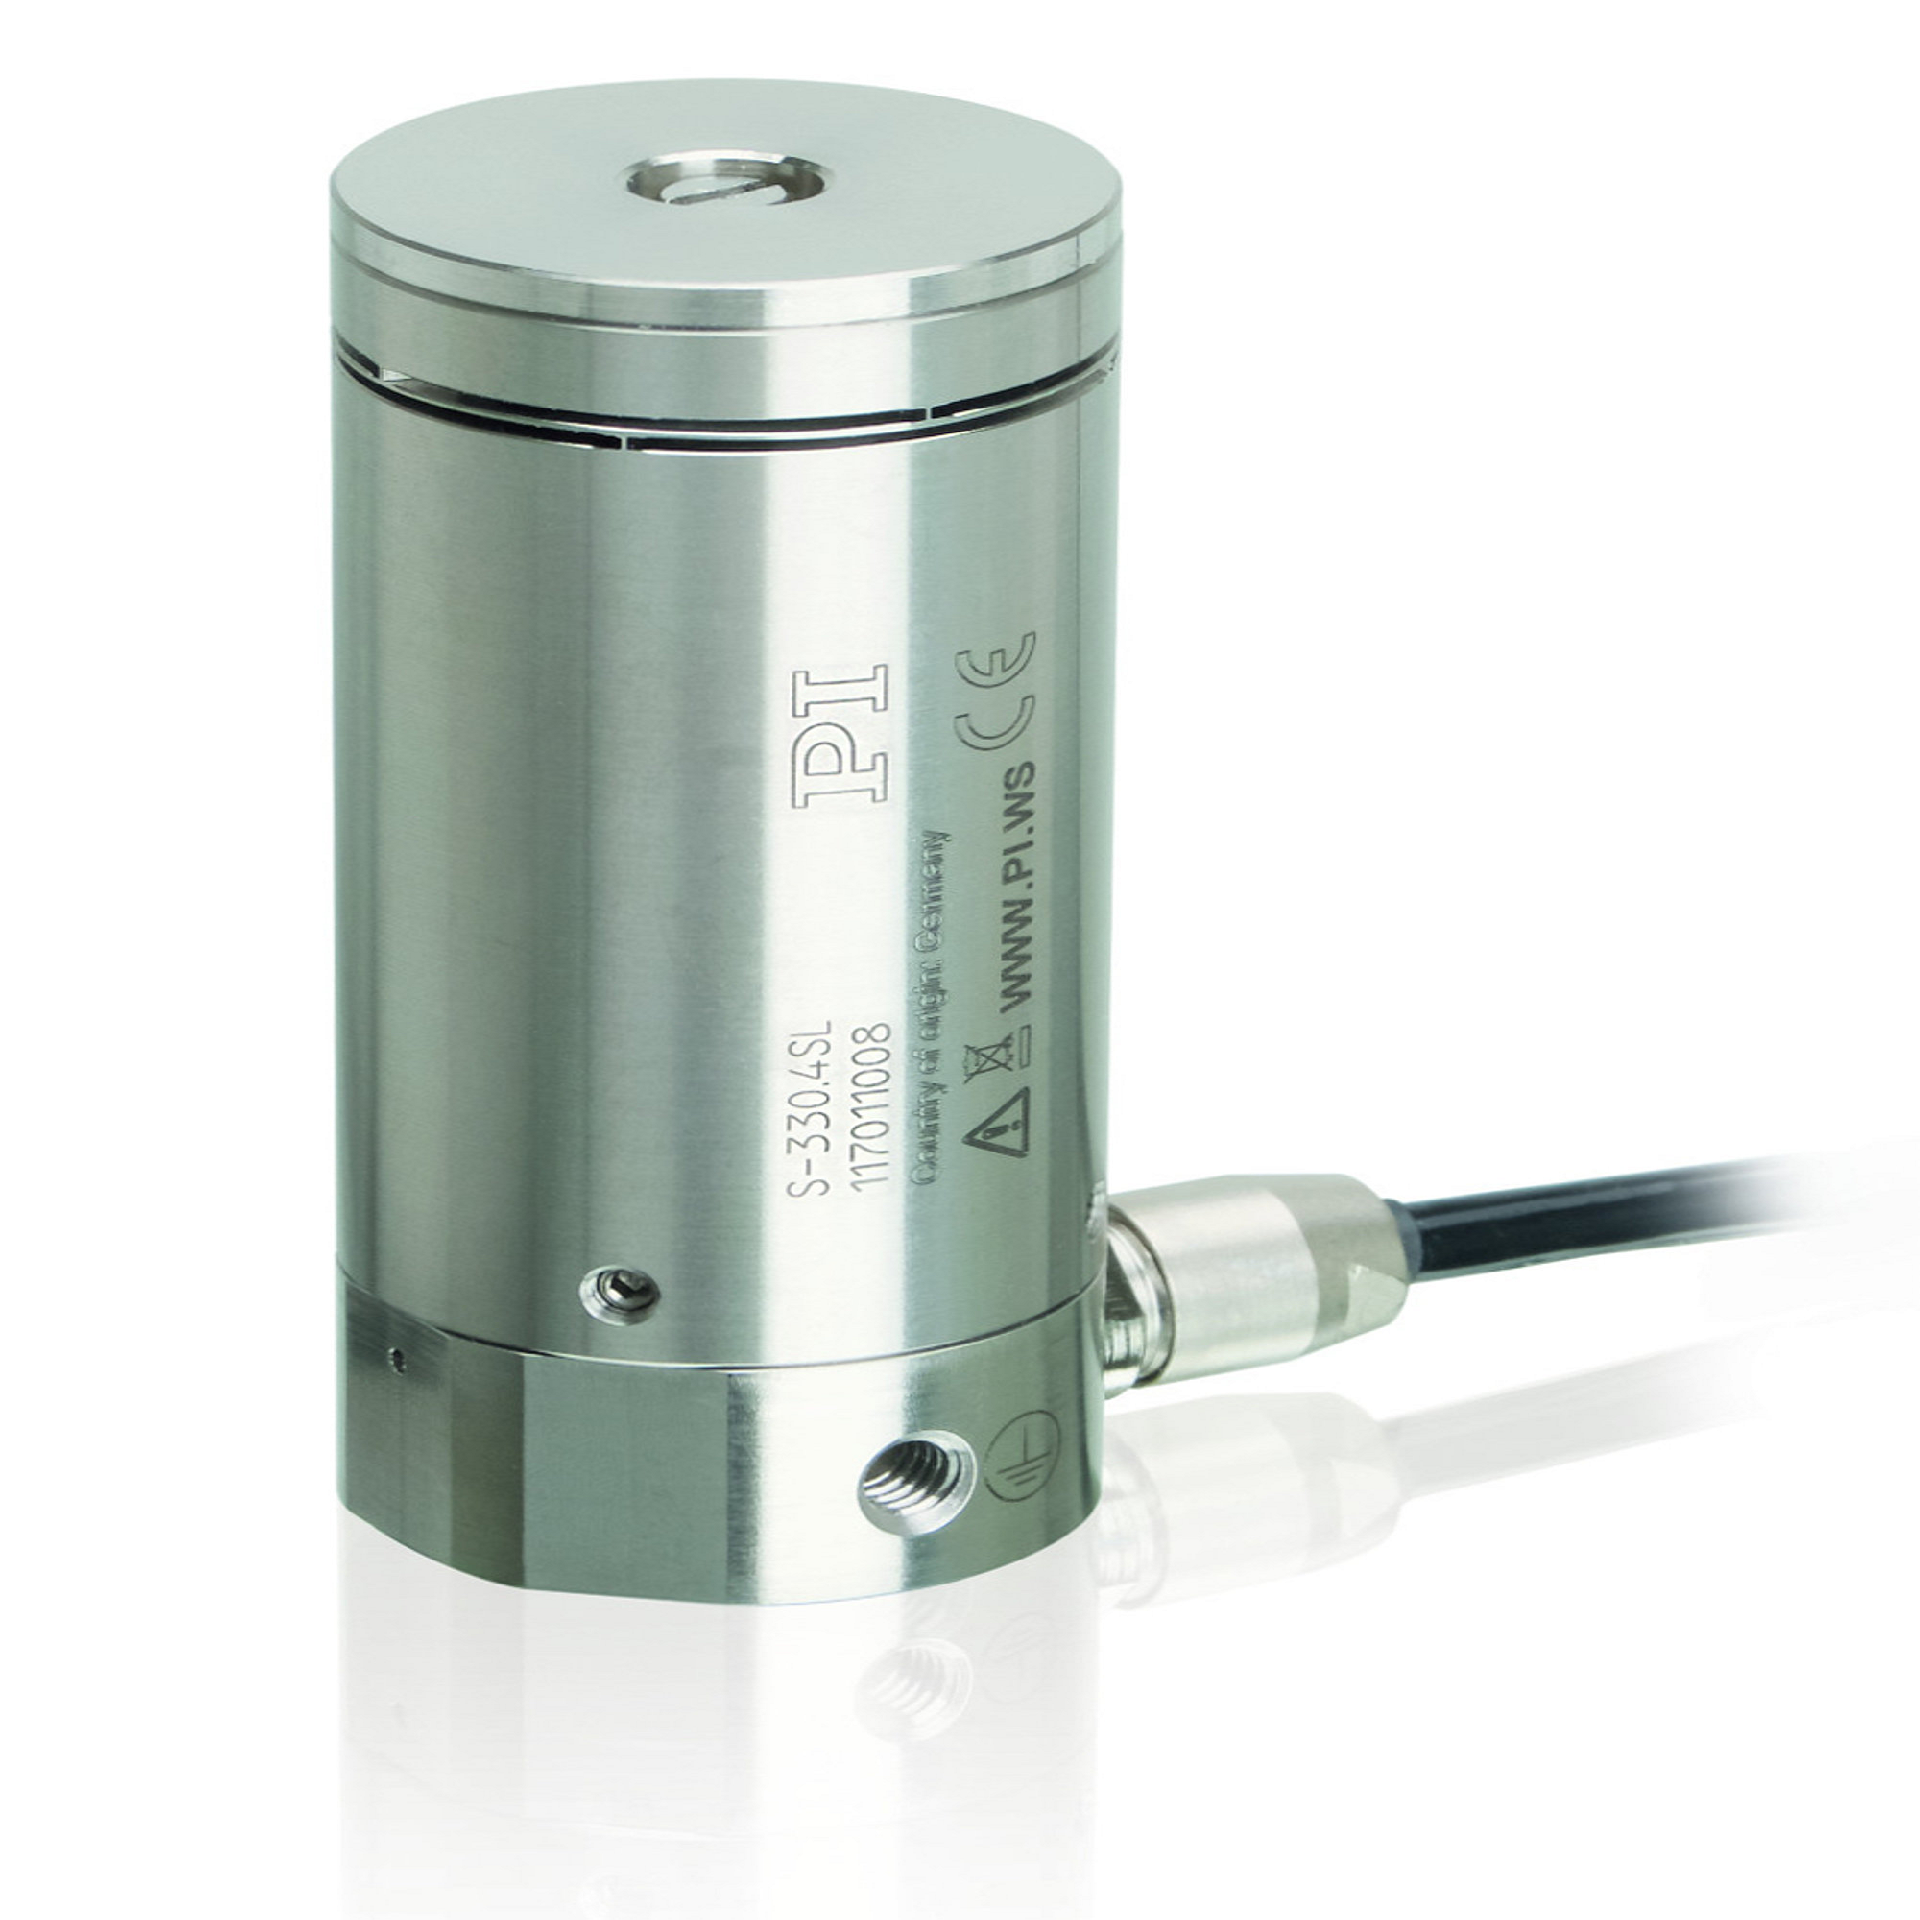 Weforma工业减震器WS-M 1,0